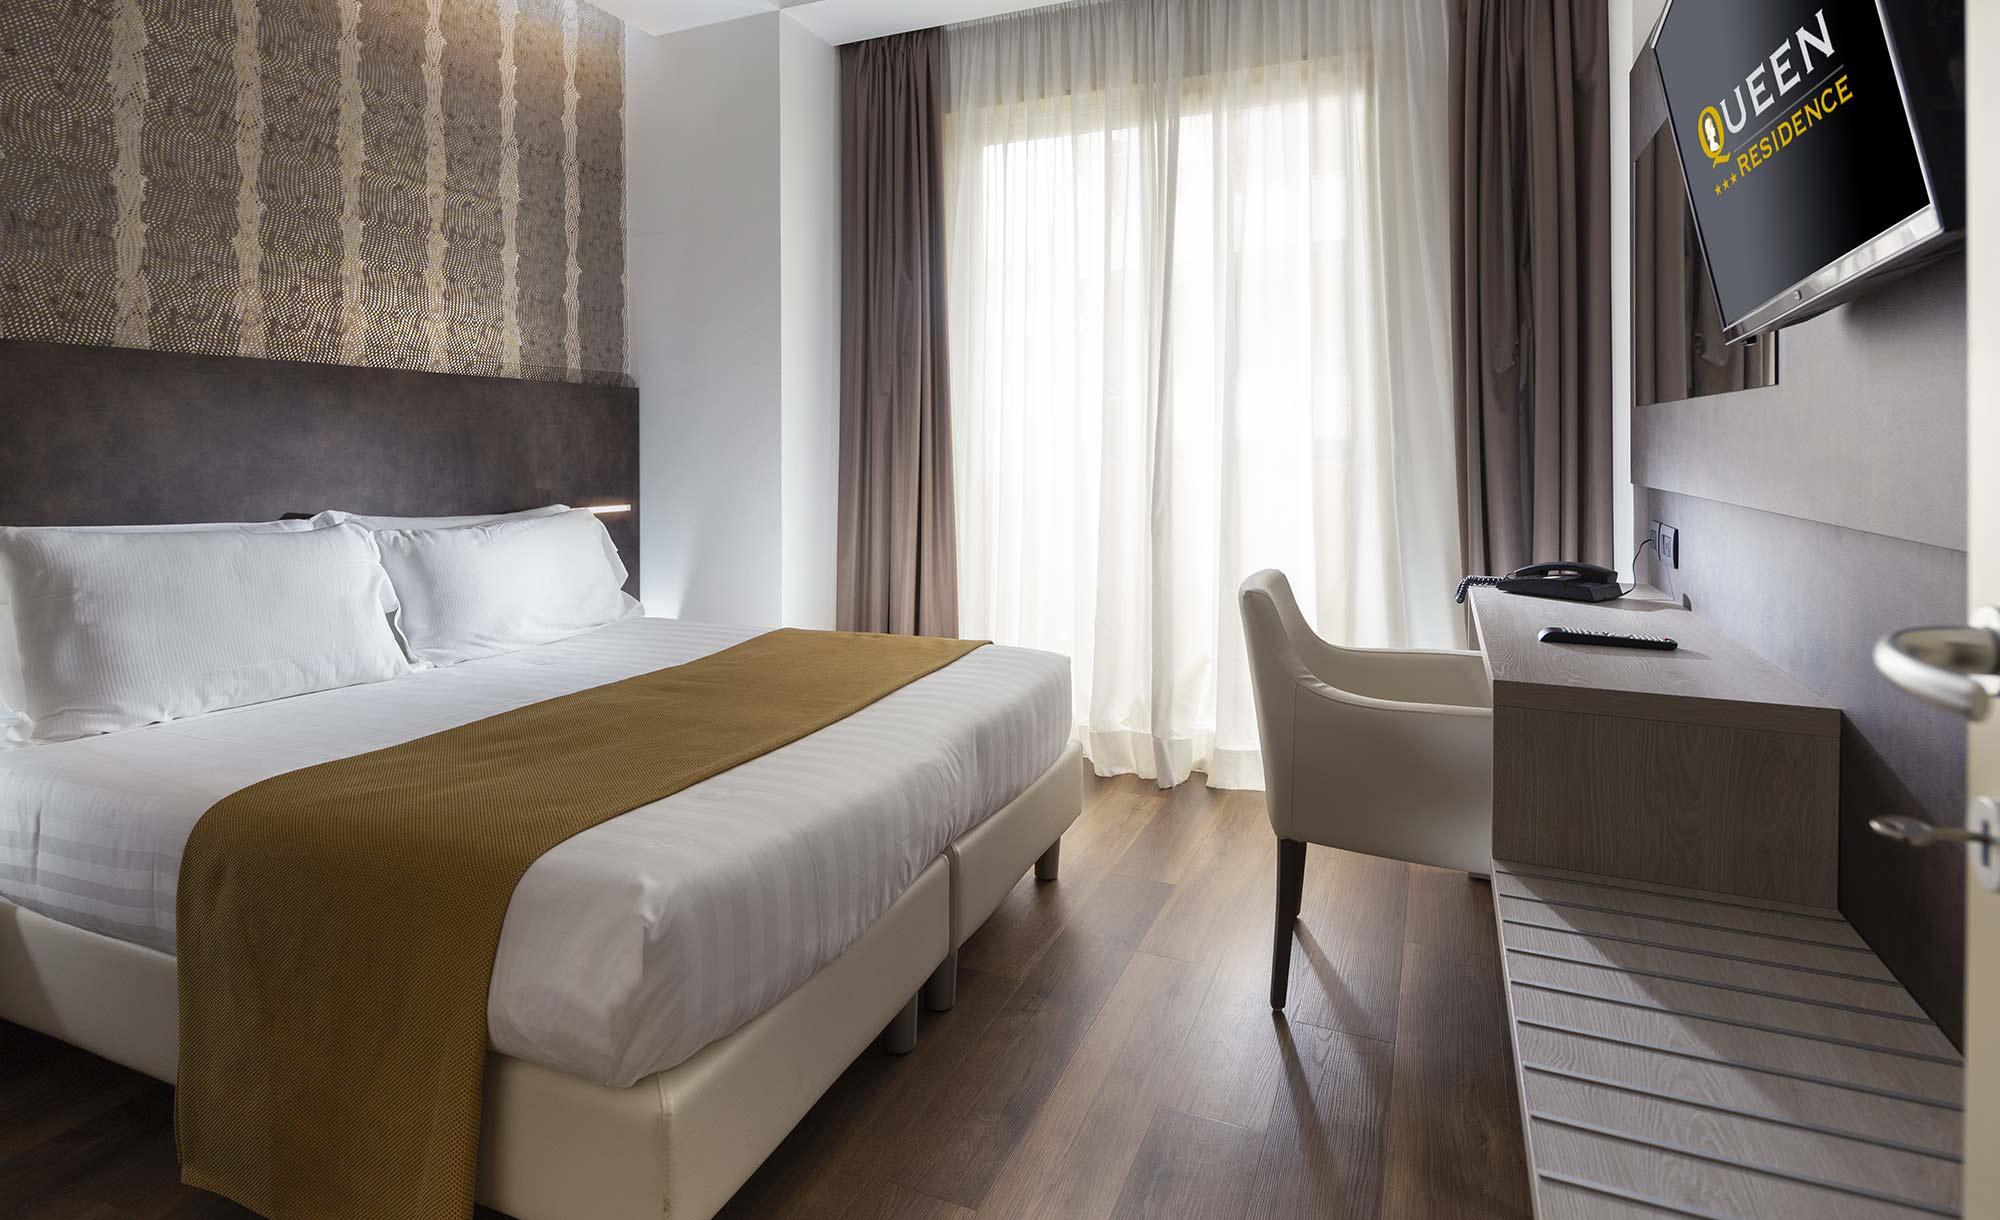 Rimini Residence: aparthotel by the sea in Rimini Marina Centro with ...